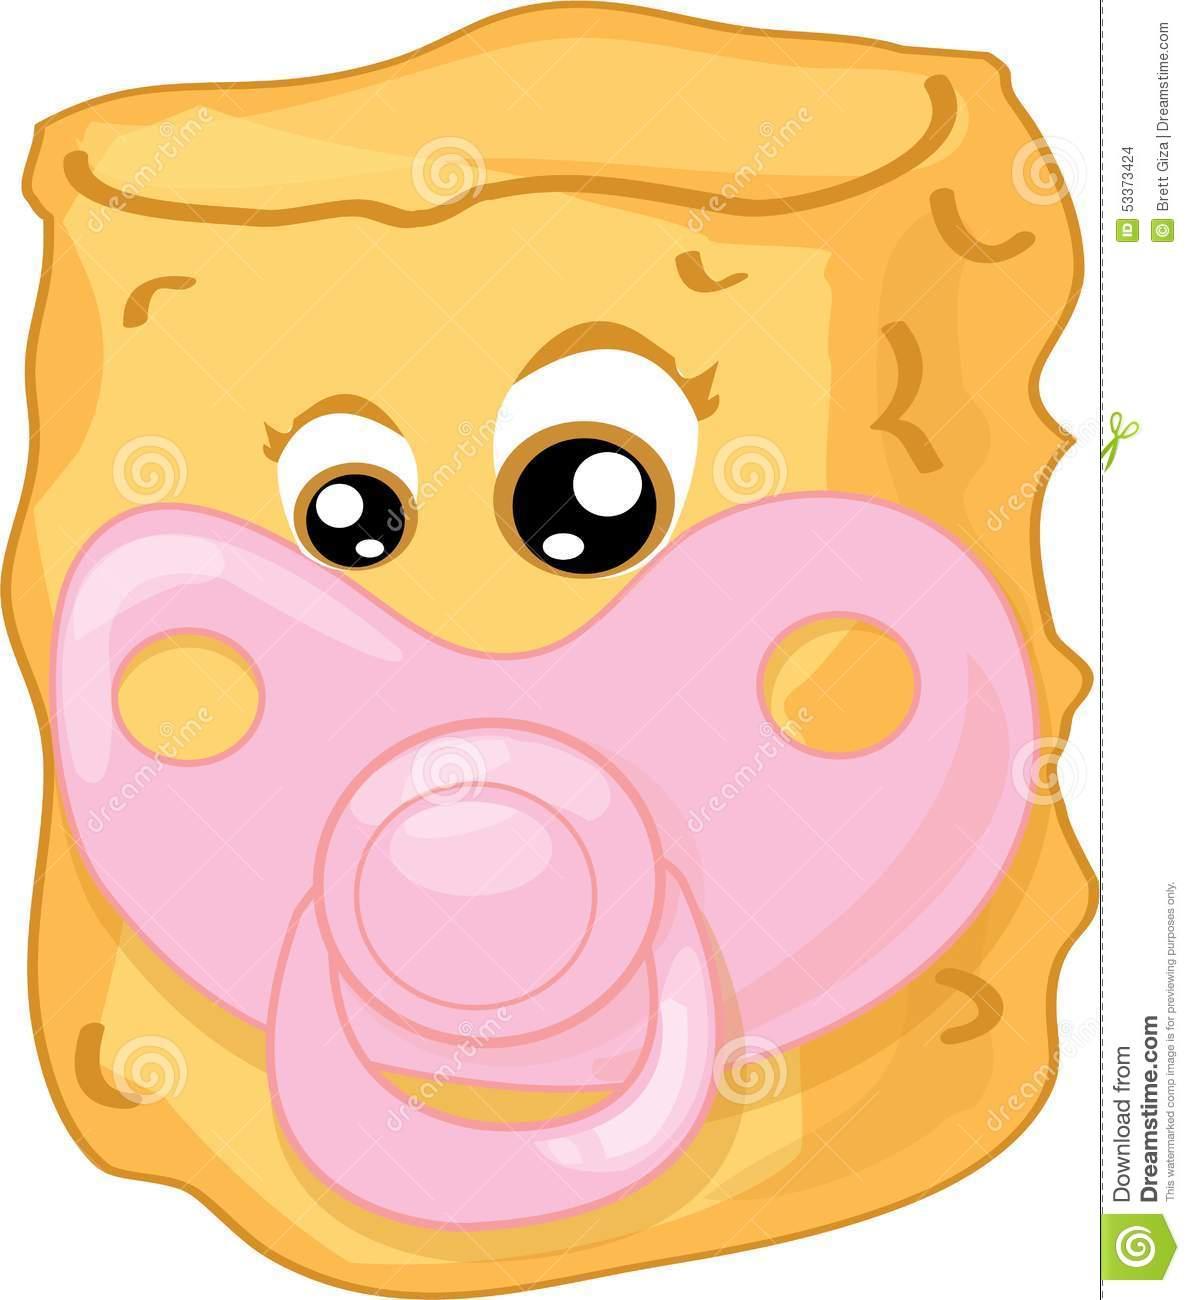 Tater Tot clipart – Tot Maize Best baby